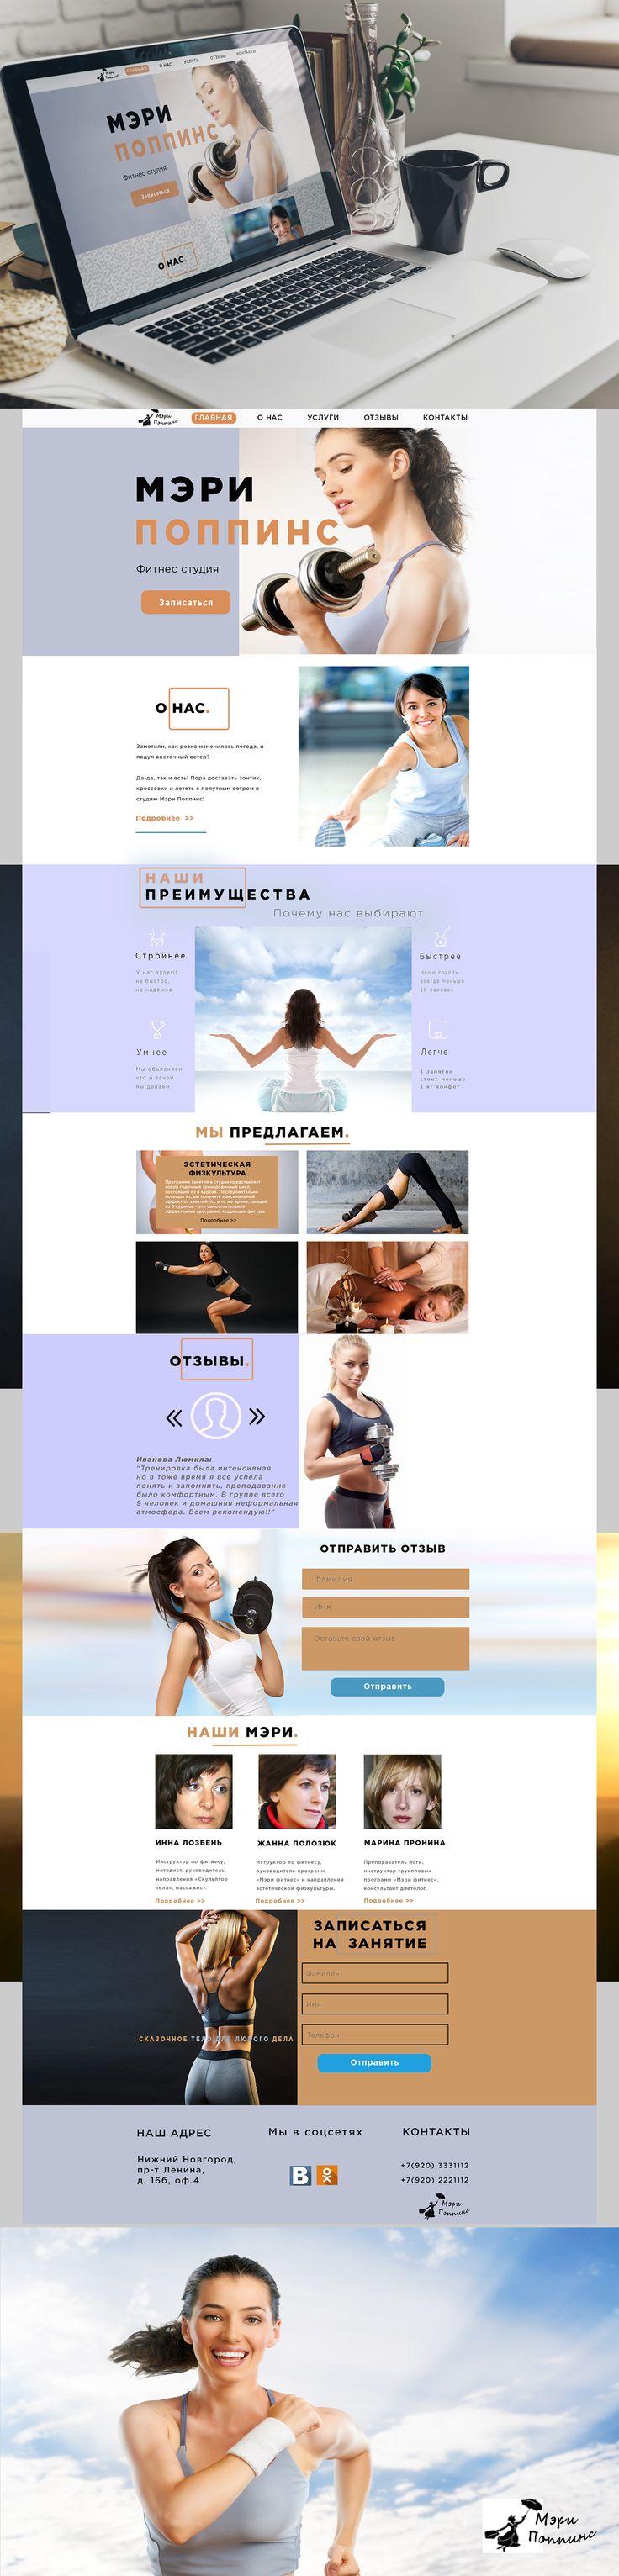 Ознакомьтесь с моим проектом @Behance: «Мэри Поппинс фитнес студия» https://www.behance.net/gallery/50829473/meri-poppins-fitnes-studija